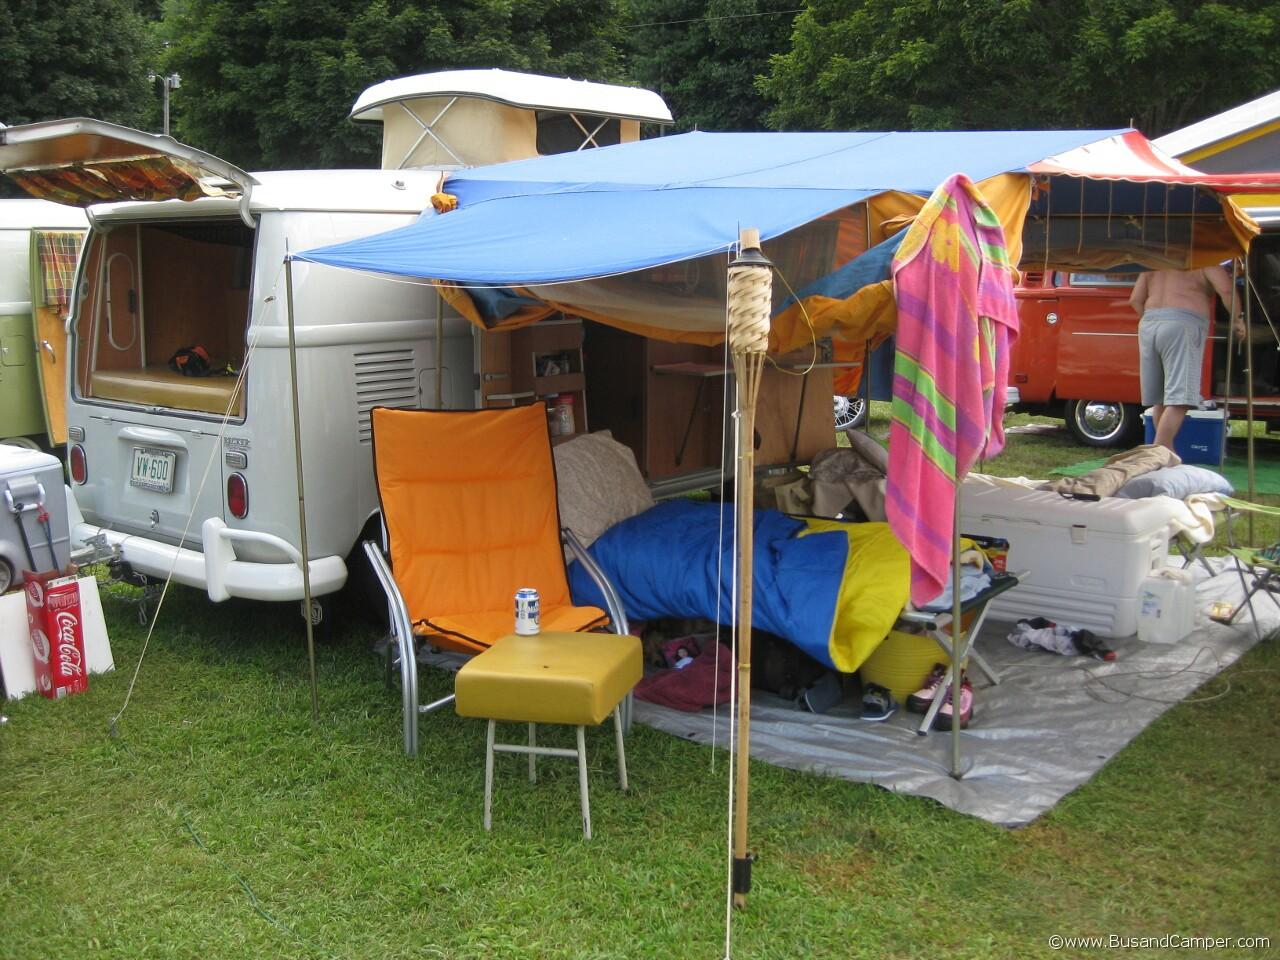 Big top Tent on 1967 so42 Westfalia Campervan